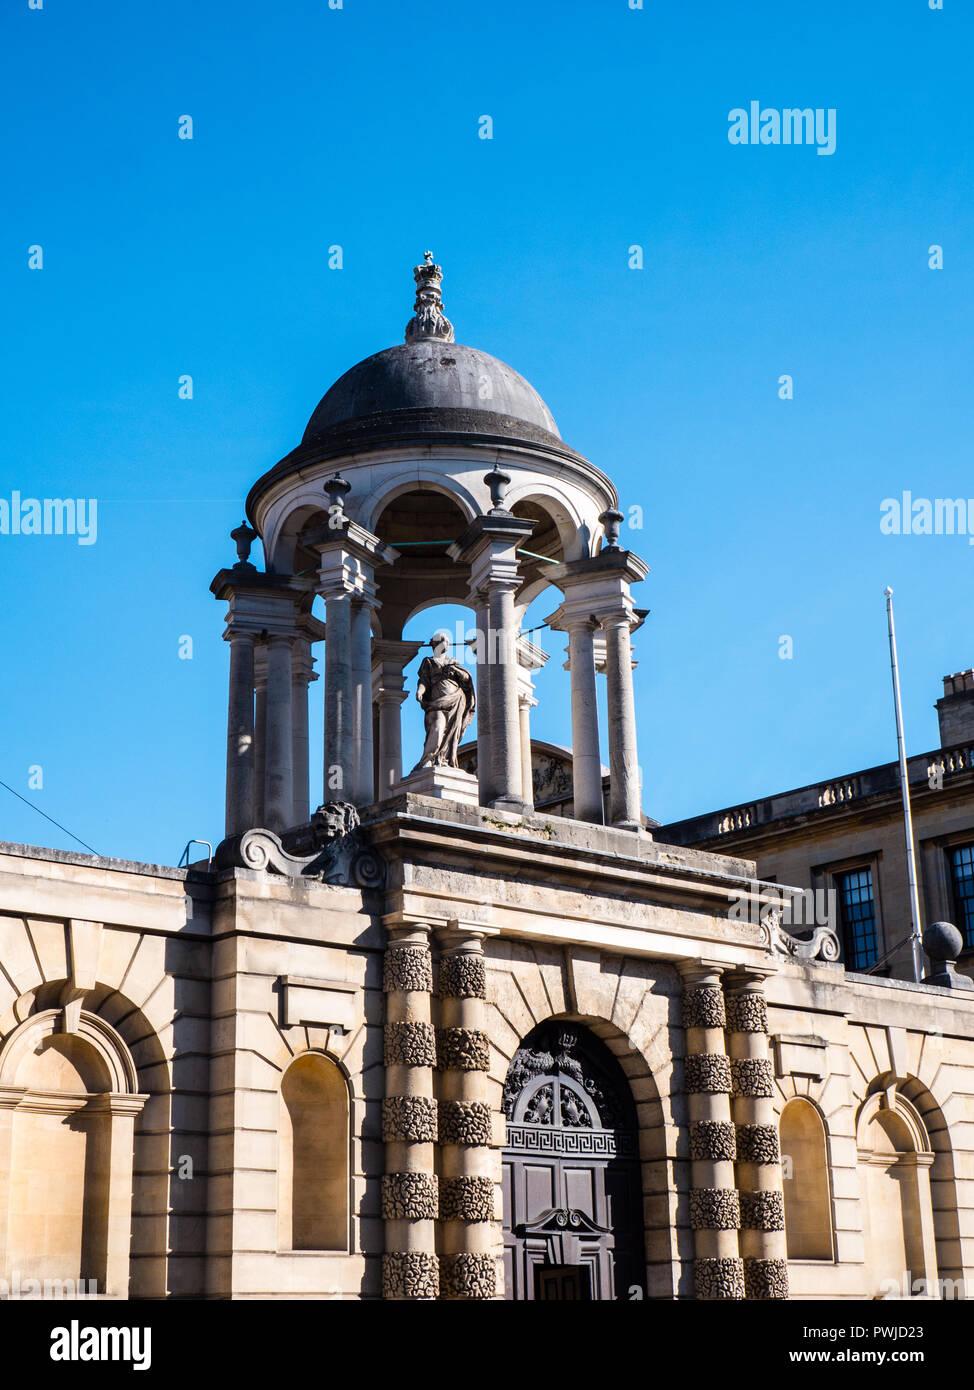 Nicholas Hawksmoor Statue above Porters Entrance, Queens College, Oxford University, Oxford, Oxfordshire, England, UK, GB. - Stock Image